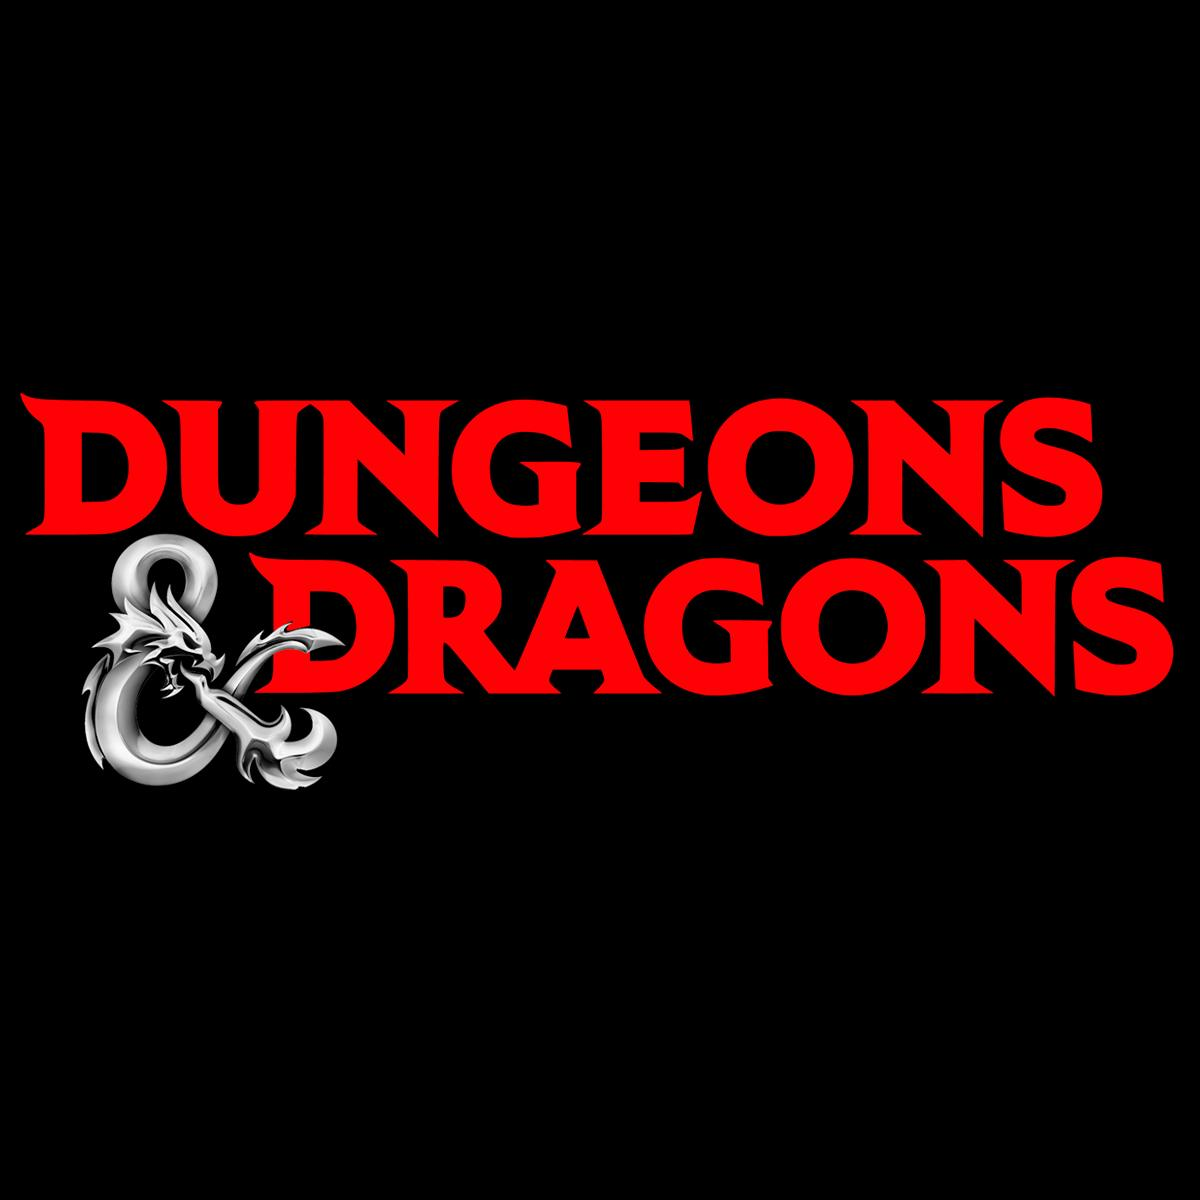 Dungeons and Dragons Minitomo Druida Deck RPG